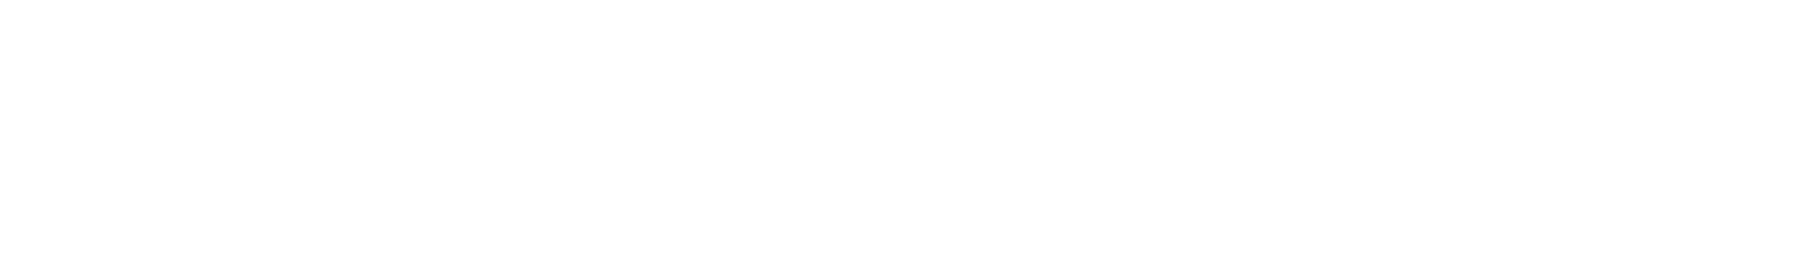 melody 09bpm80keyf